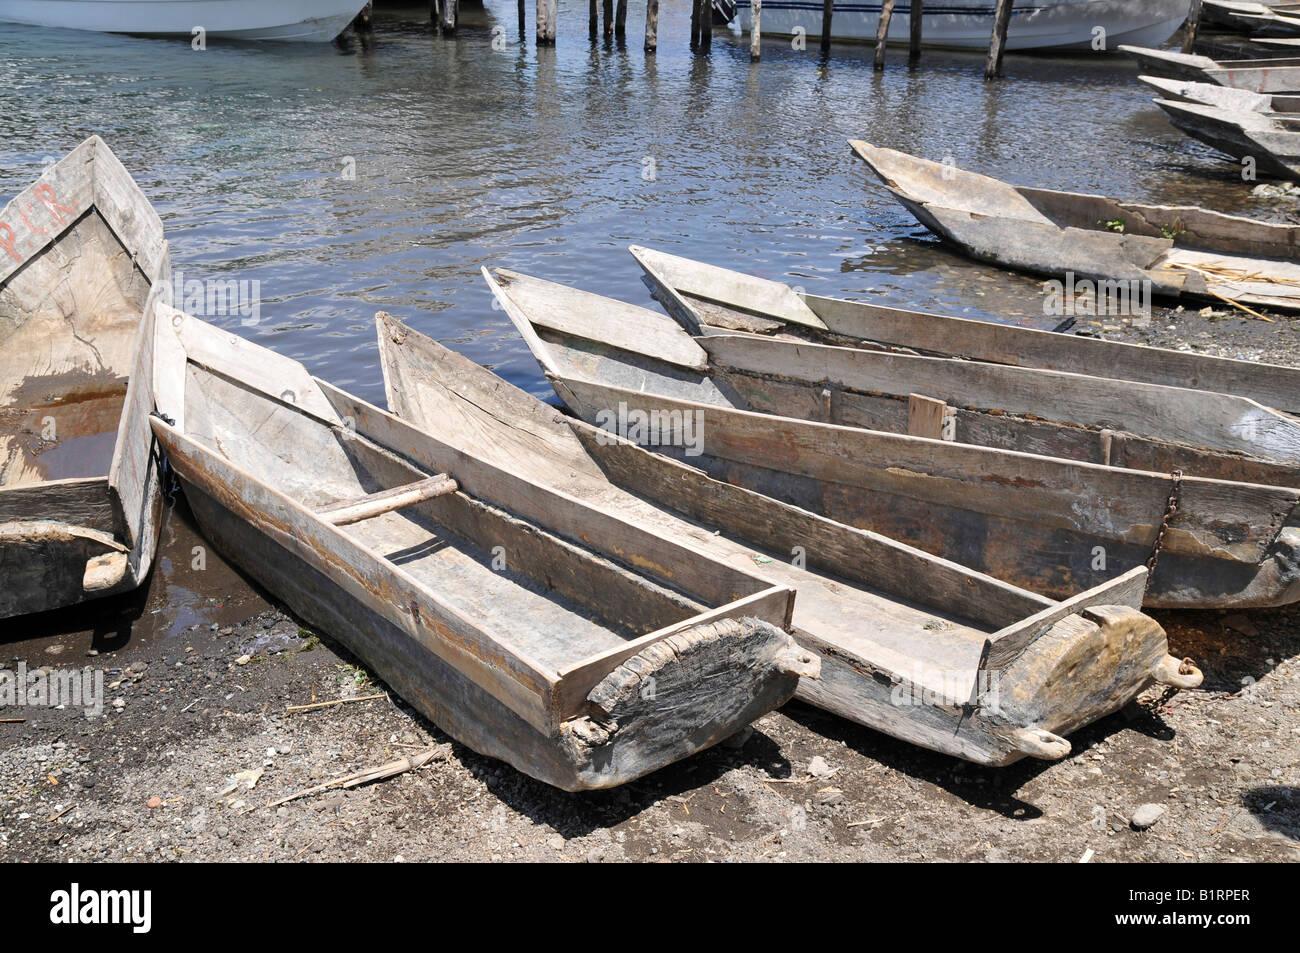 Rowboats, Santiago Atitlan, Lake Atitlan, Guatemala, Central America - Stock Image